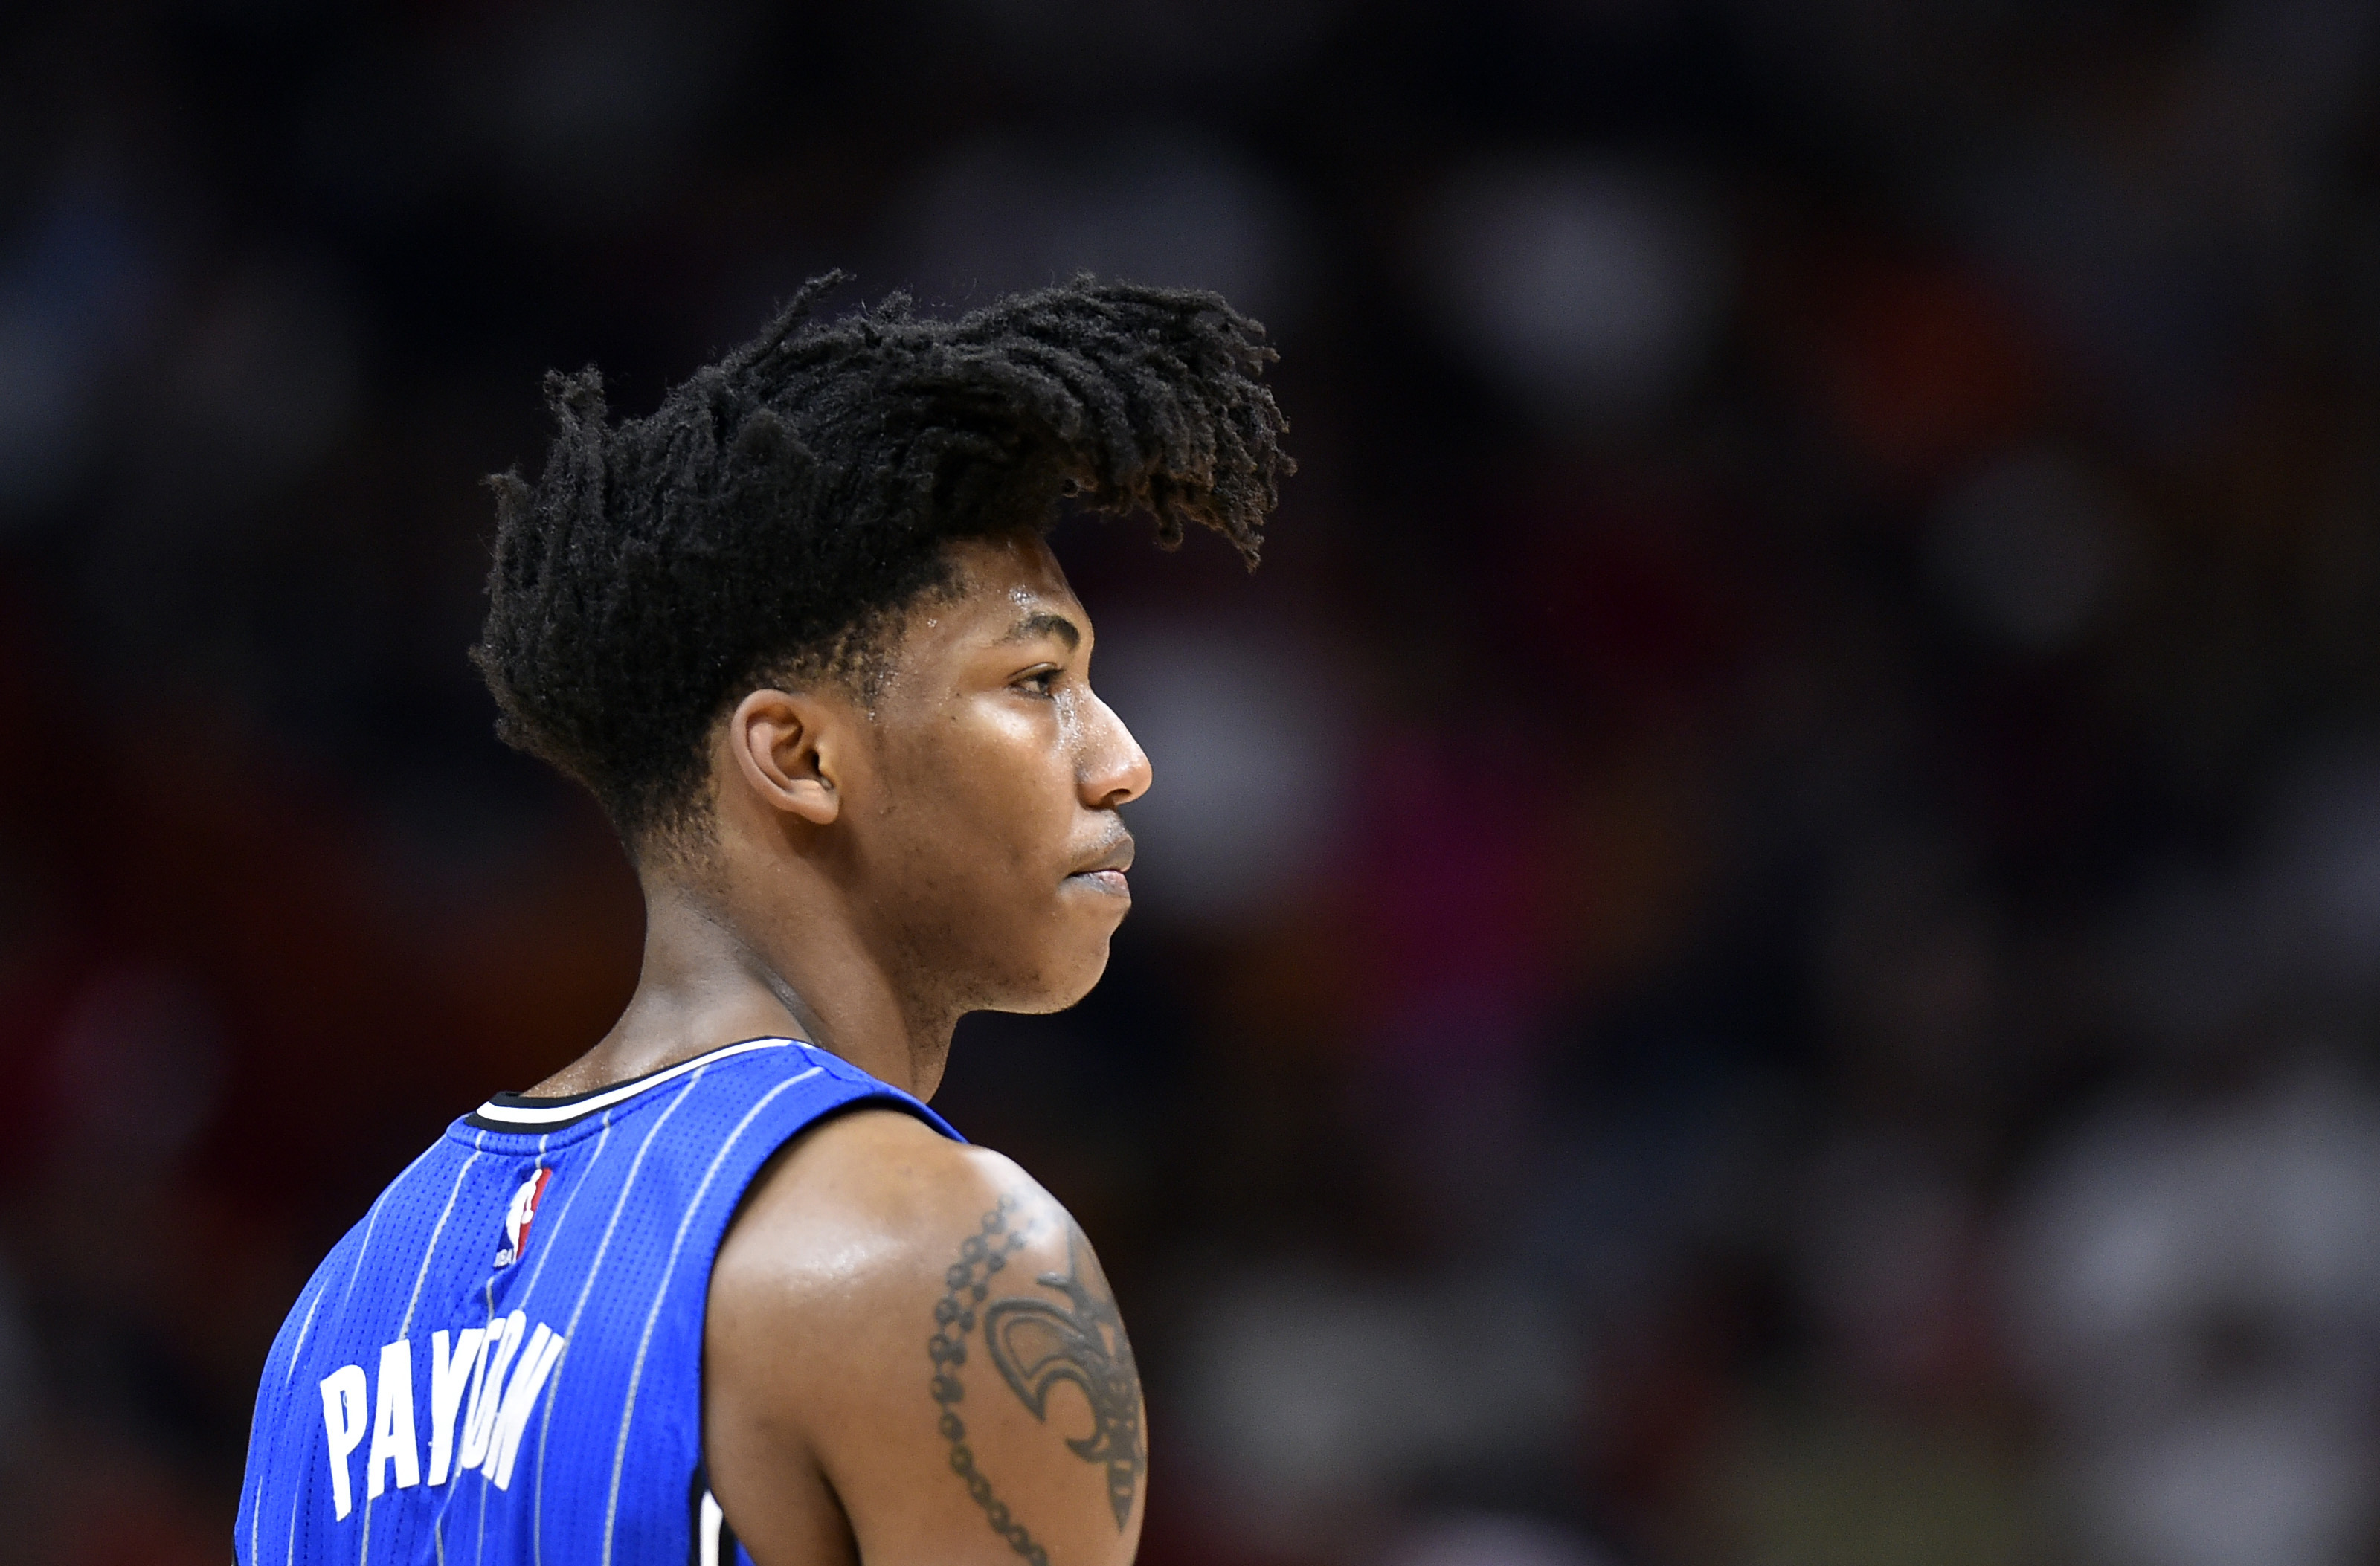 Nba Game Tonight Point Spread | Basketball Scores